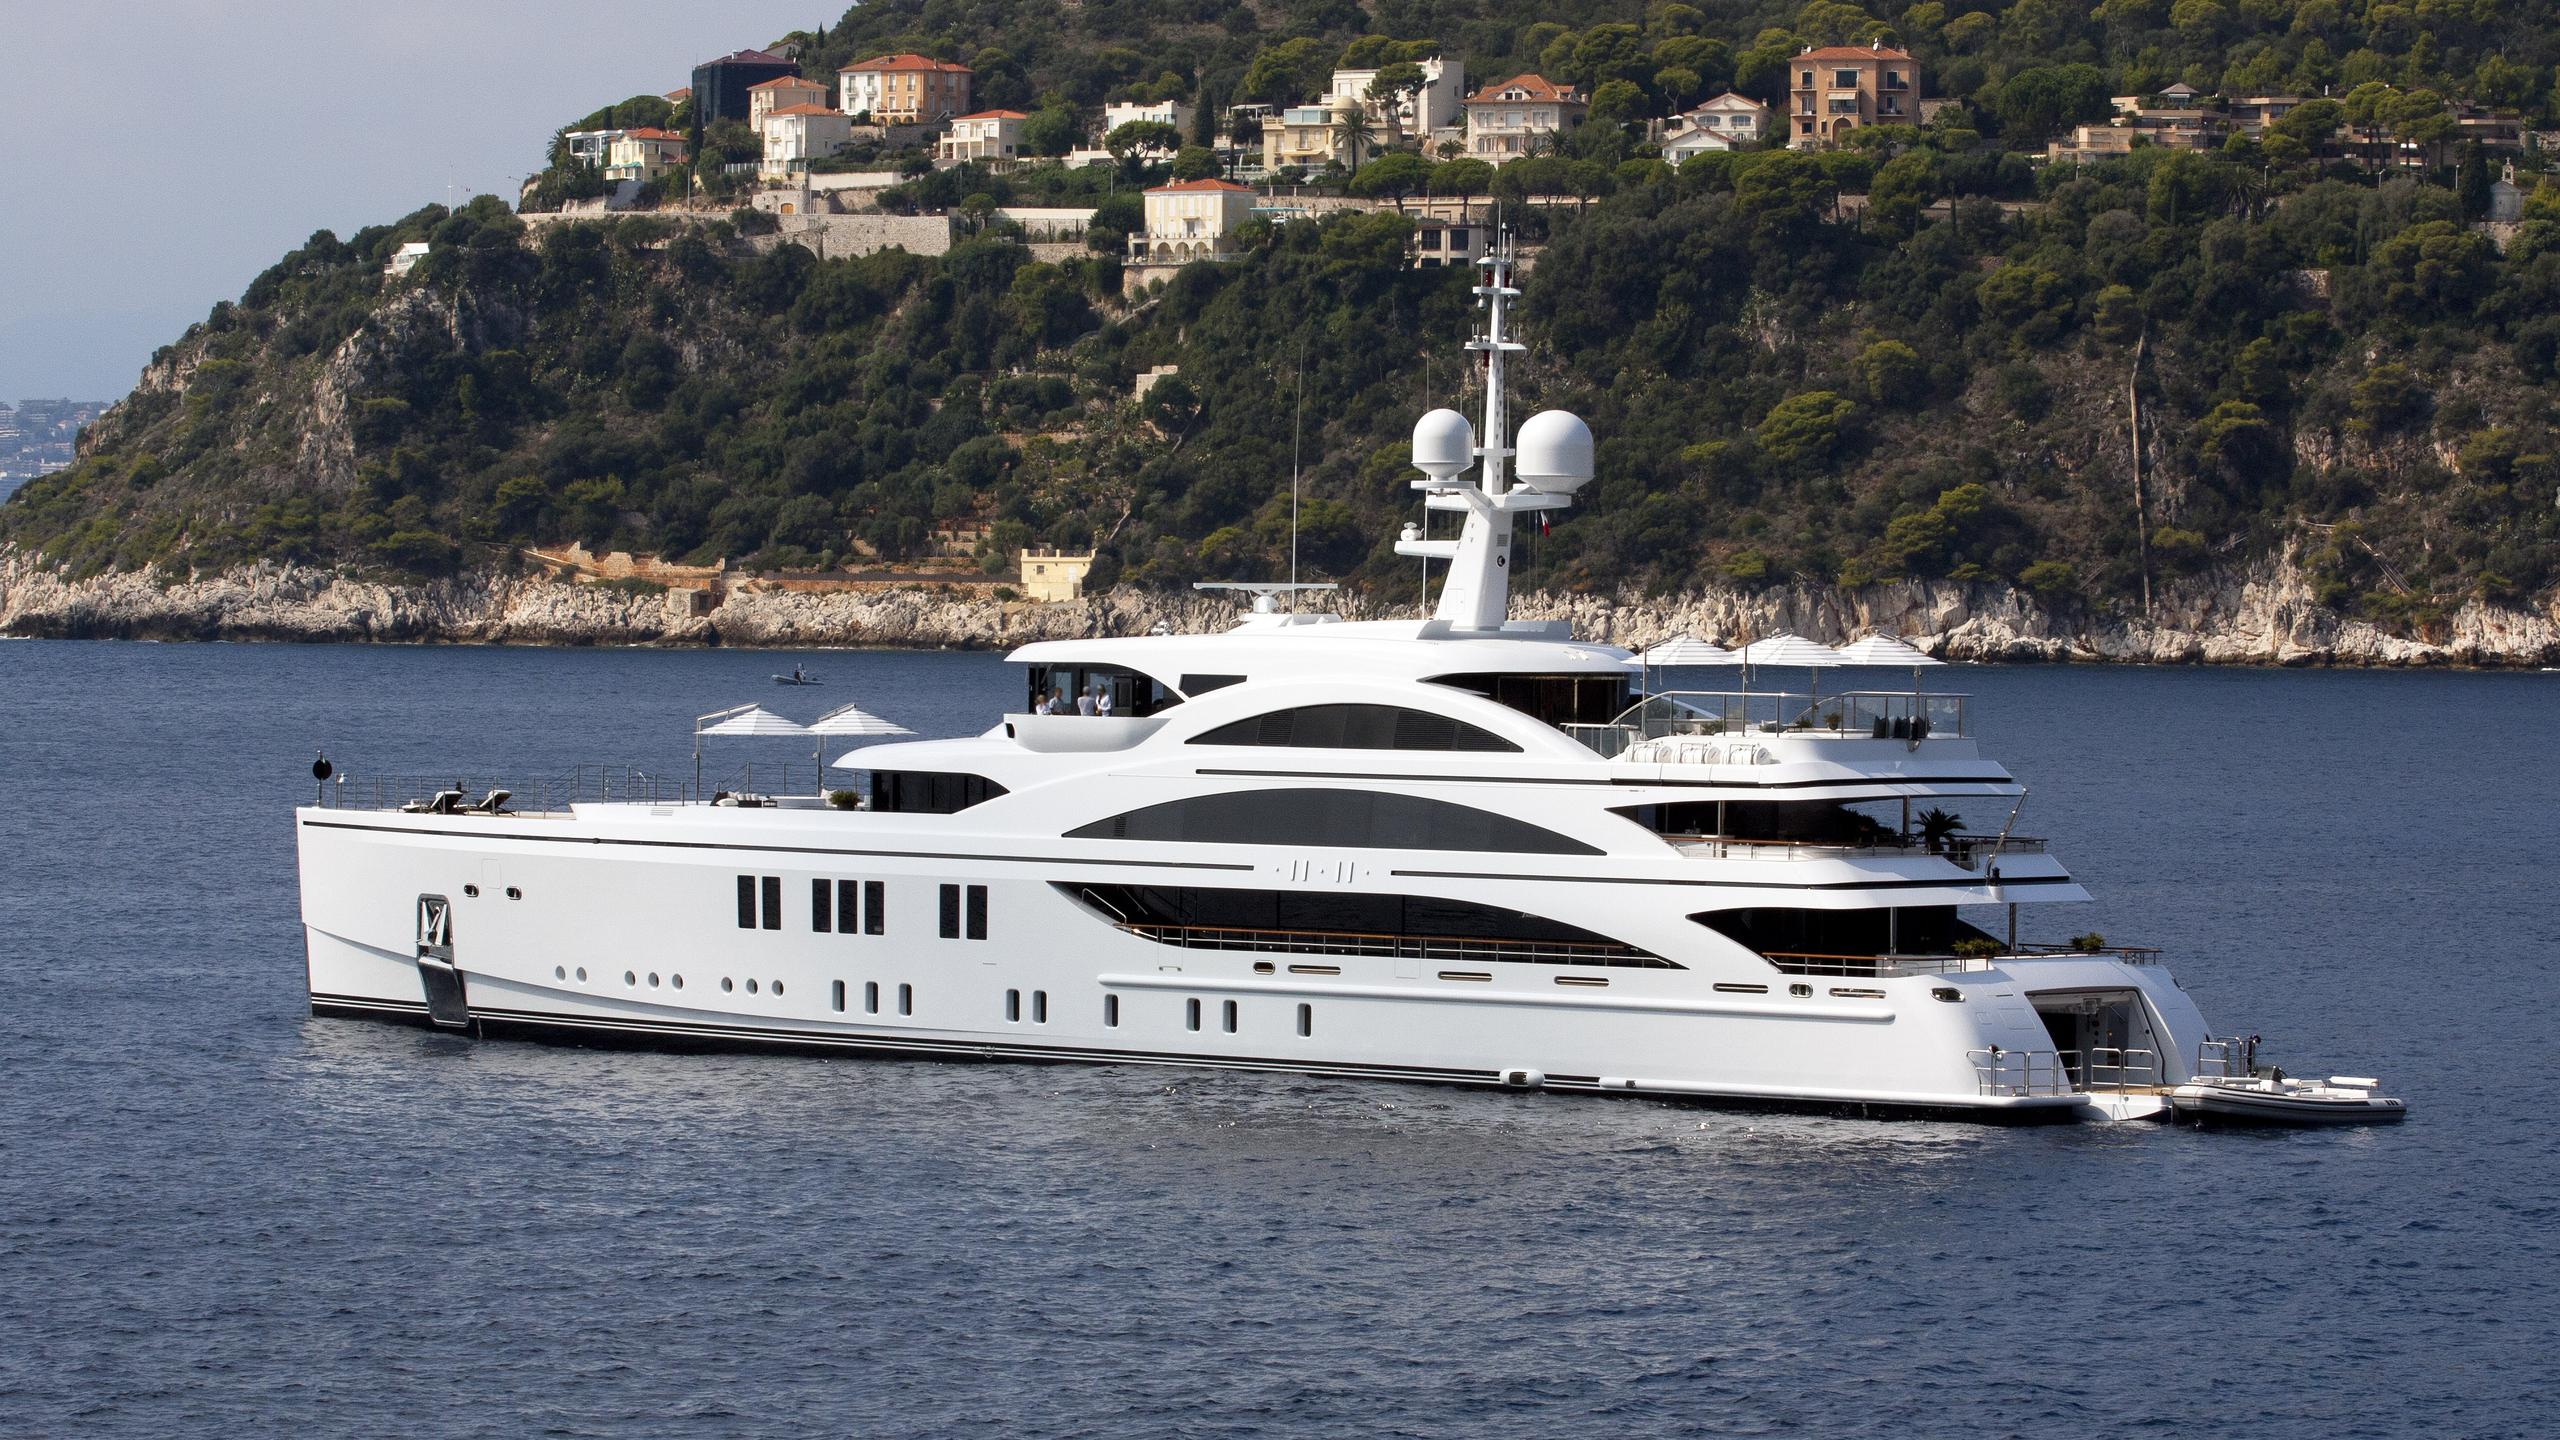 1111-motor-yacht-benetti-2015-63m-profile